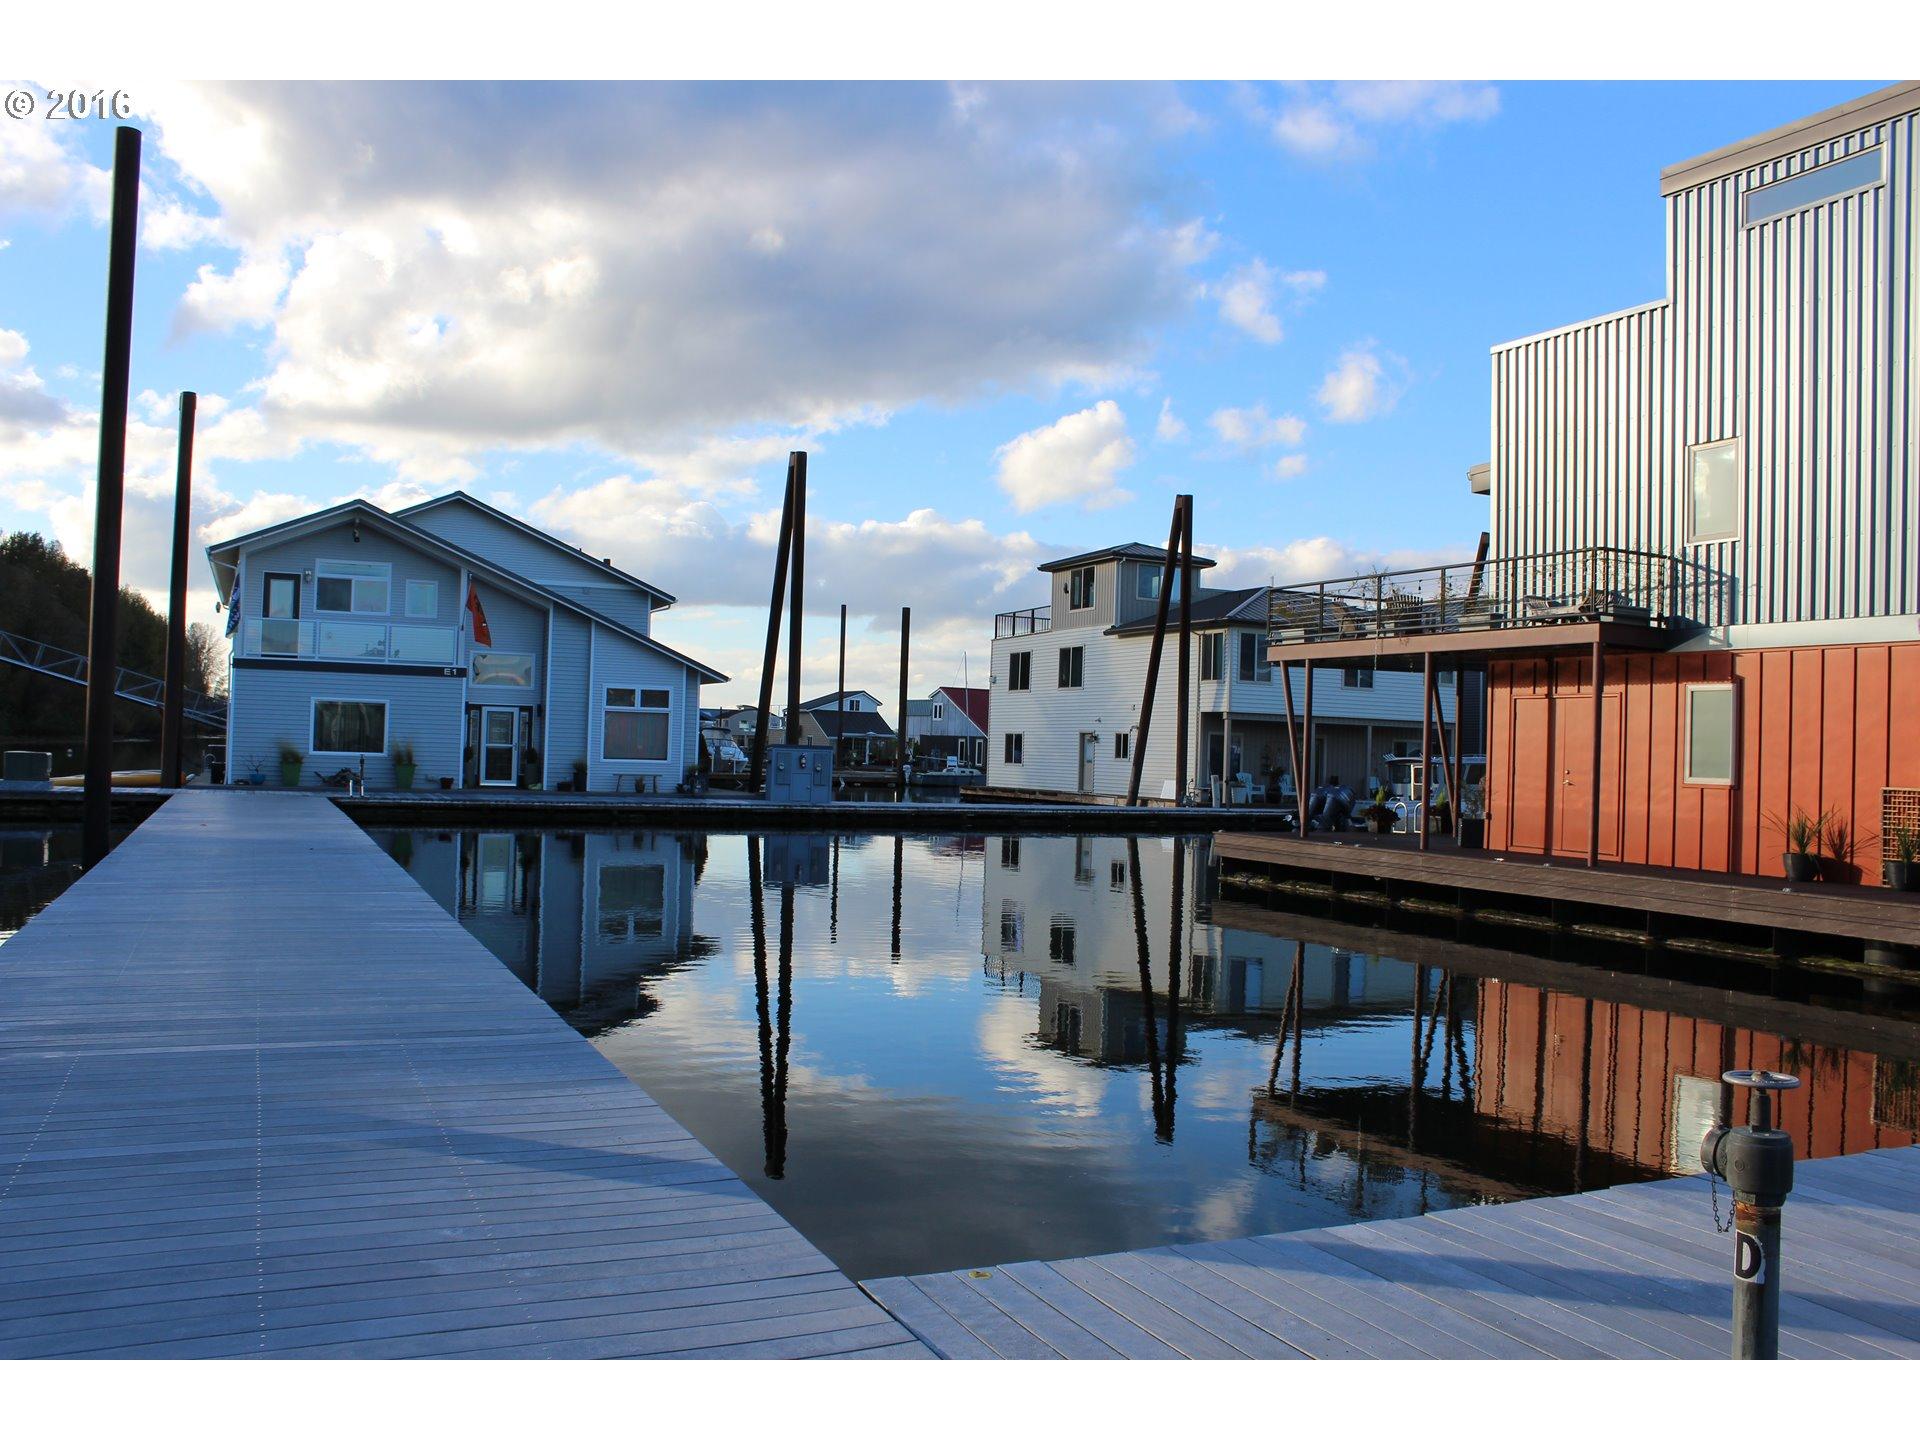 Floating Homes for Sale in Portland Oregon Floating Home 4 Photo 3